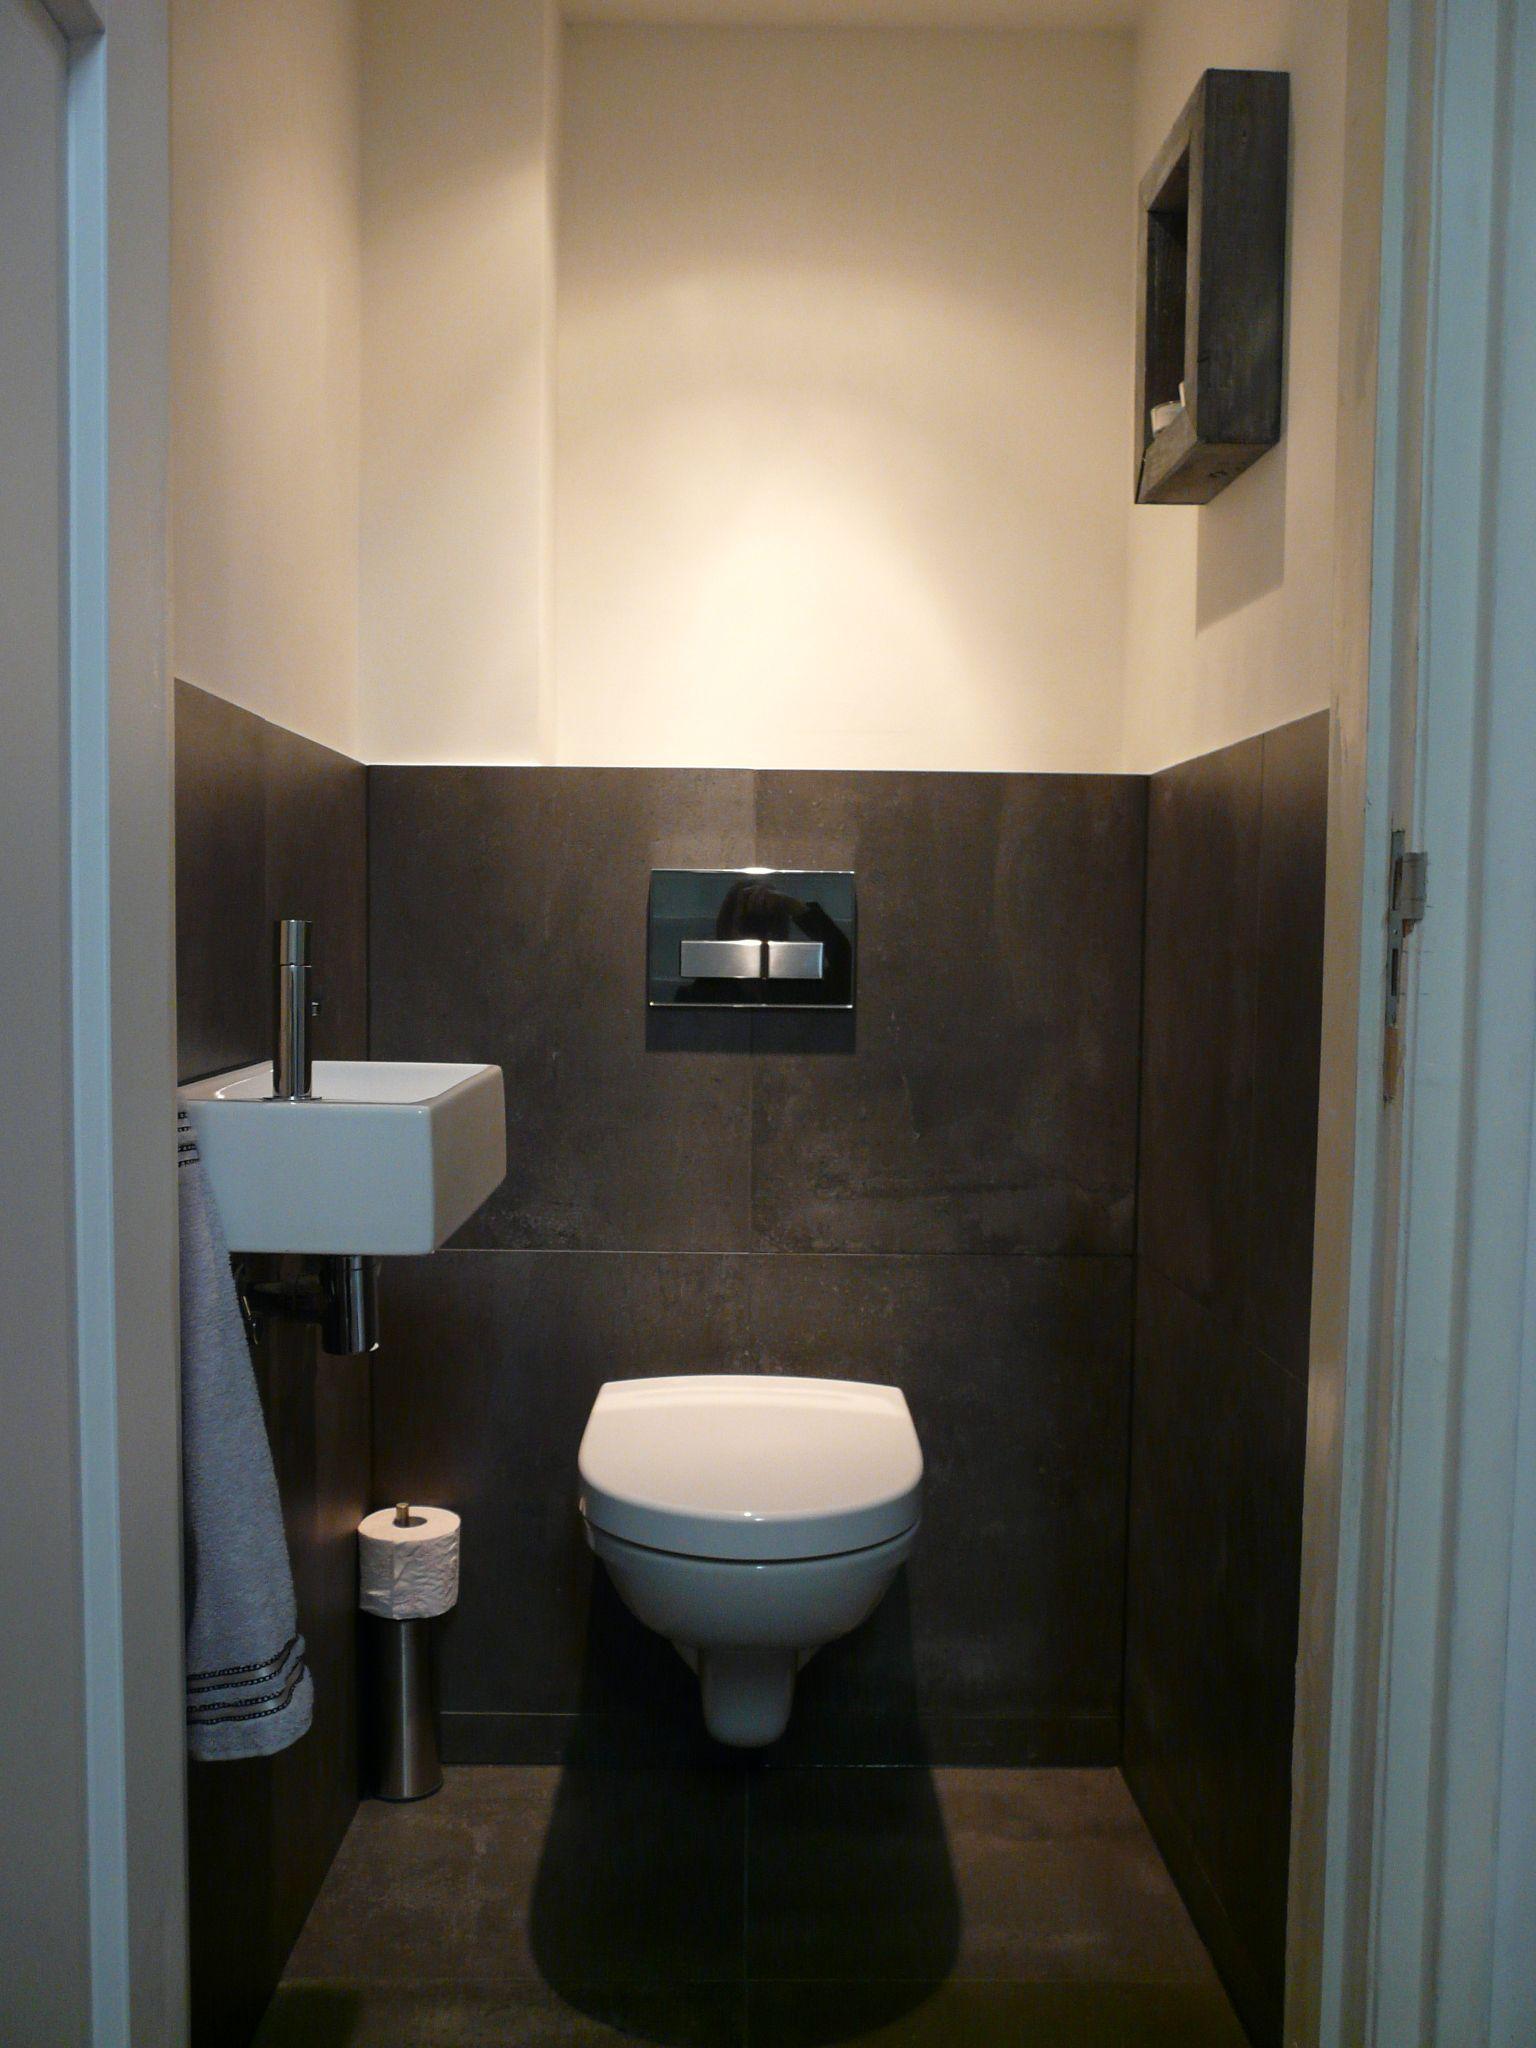 Wc apart met donkere vtwonen tegels verbouwing toilet pinterest tegels wc en badkamer - Amenager badkamer ...